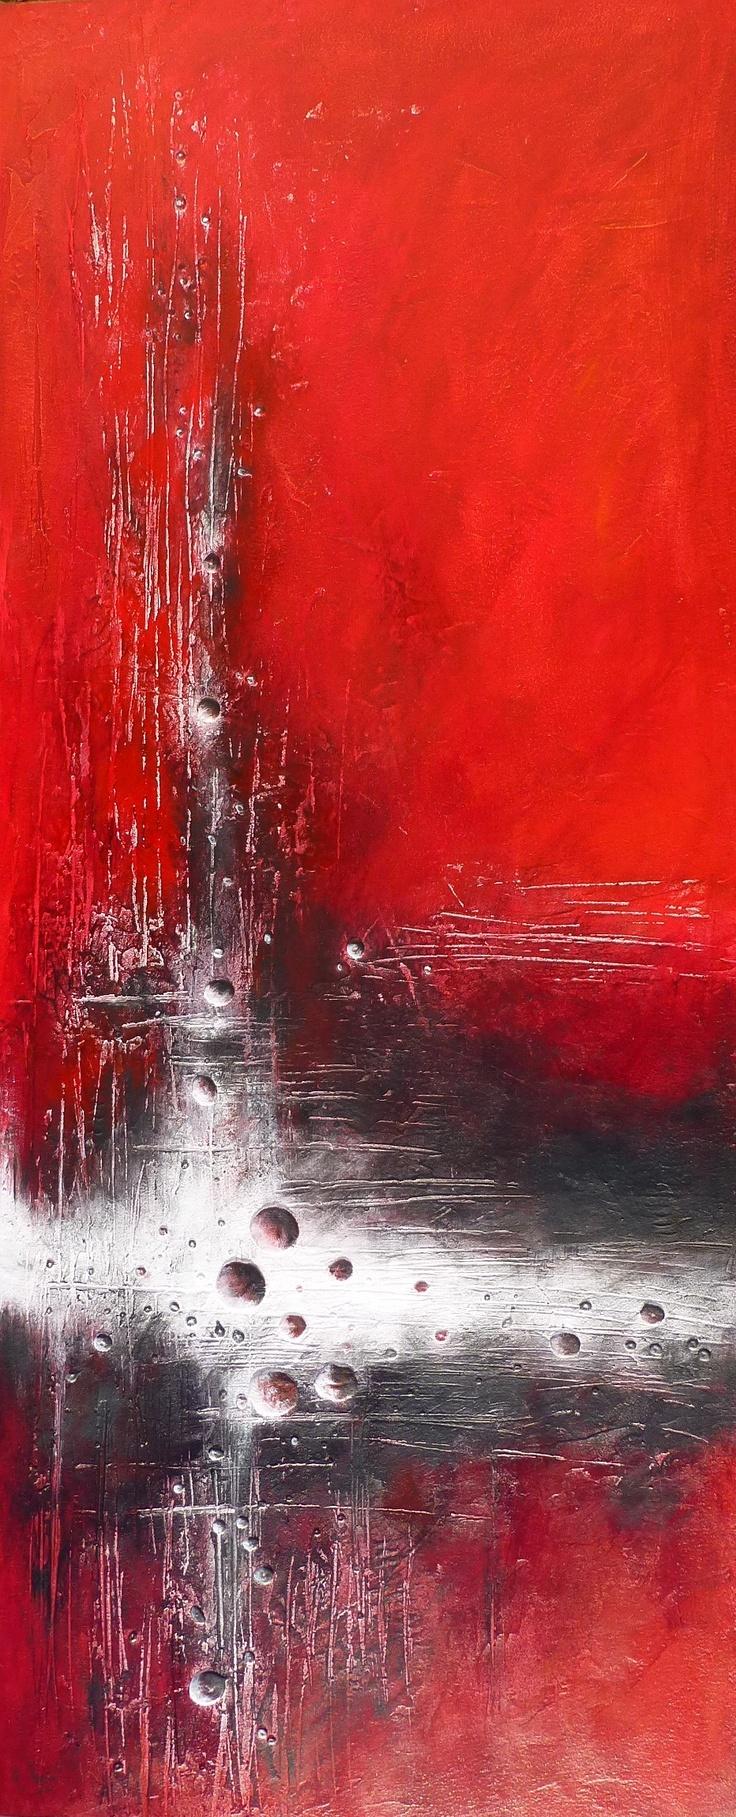 peinture style design 50x120mm - acrylique sur medium #peinture #abstrait...  from Rachel SEGUIN